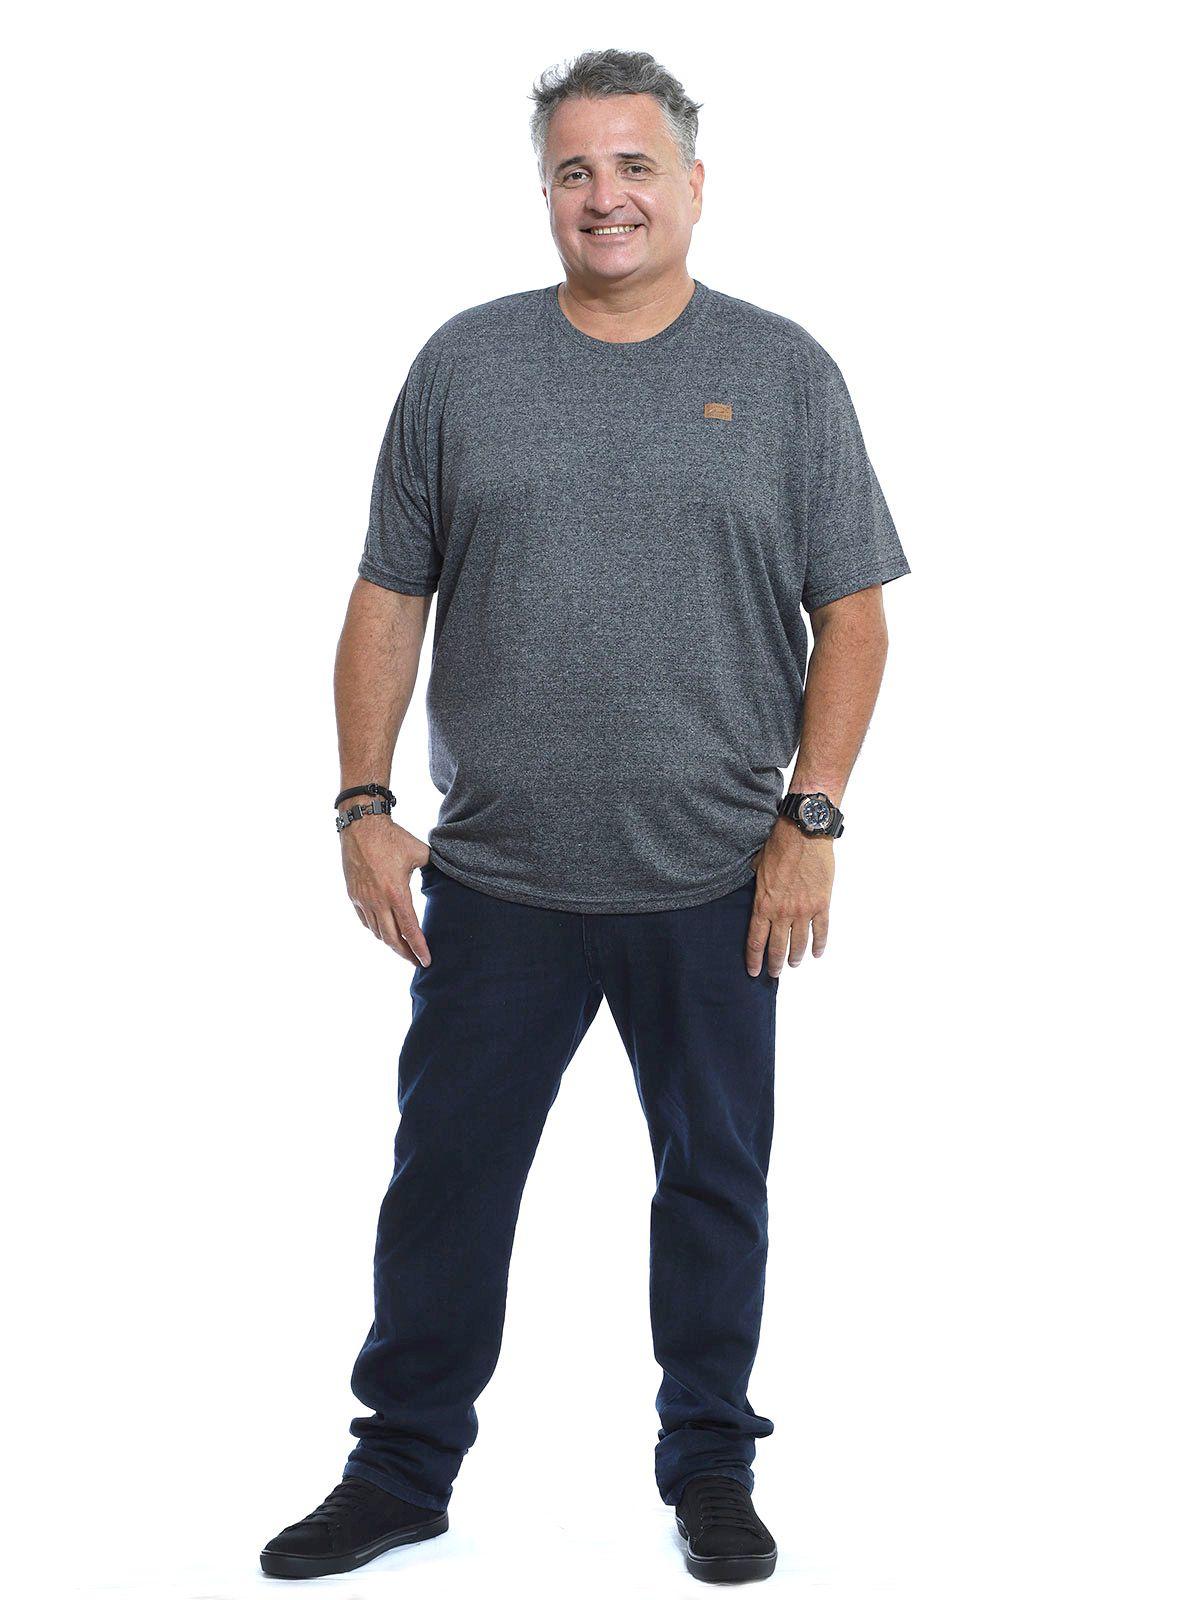 Camiseta Plus Size Anistia Mouline Ultra Fine Mescla Preto